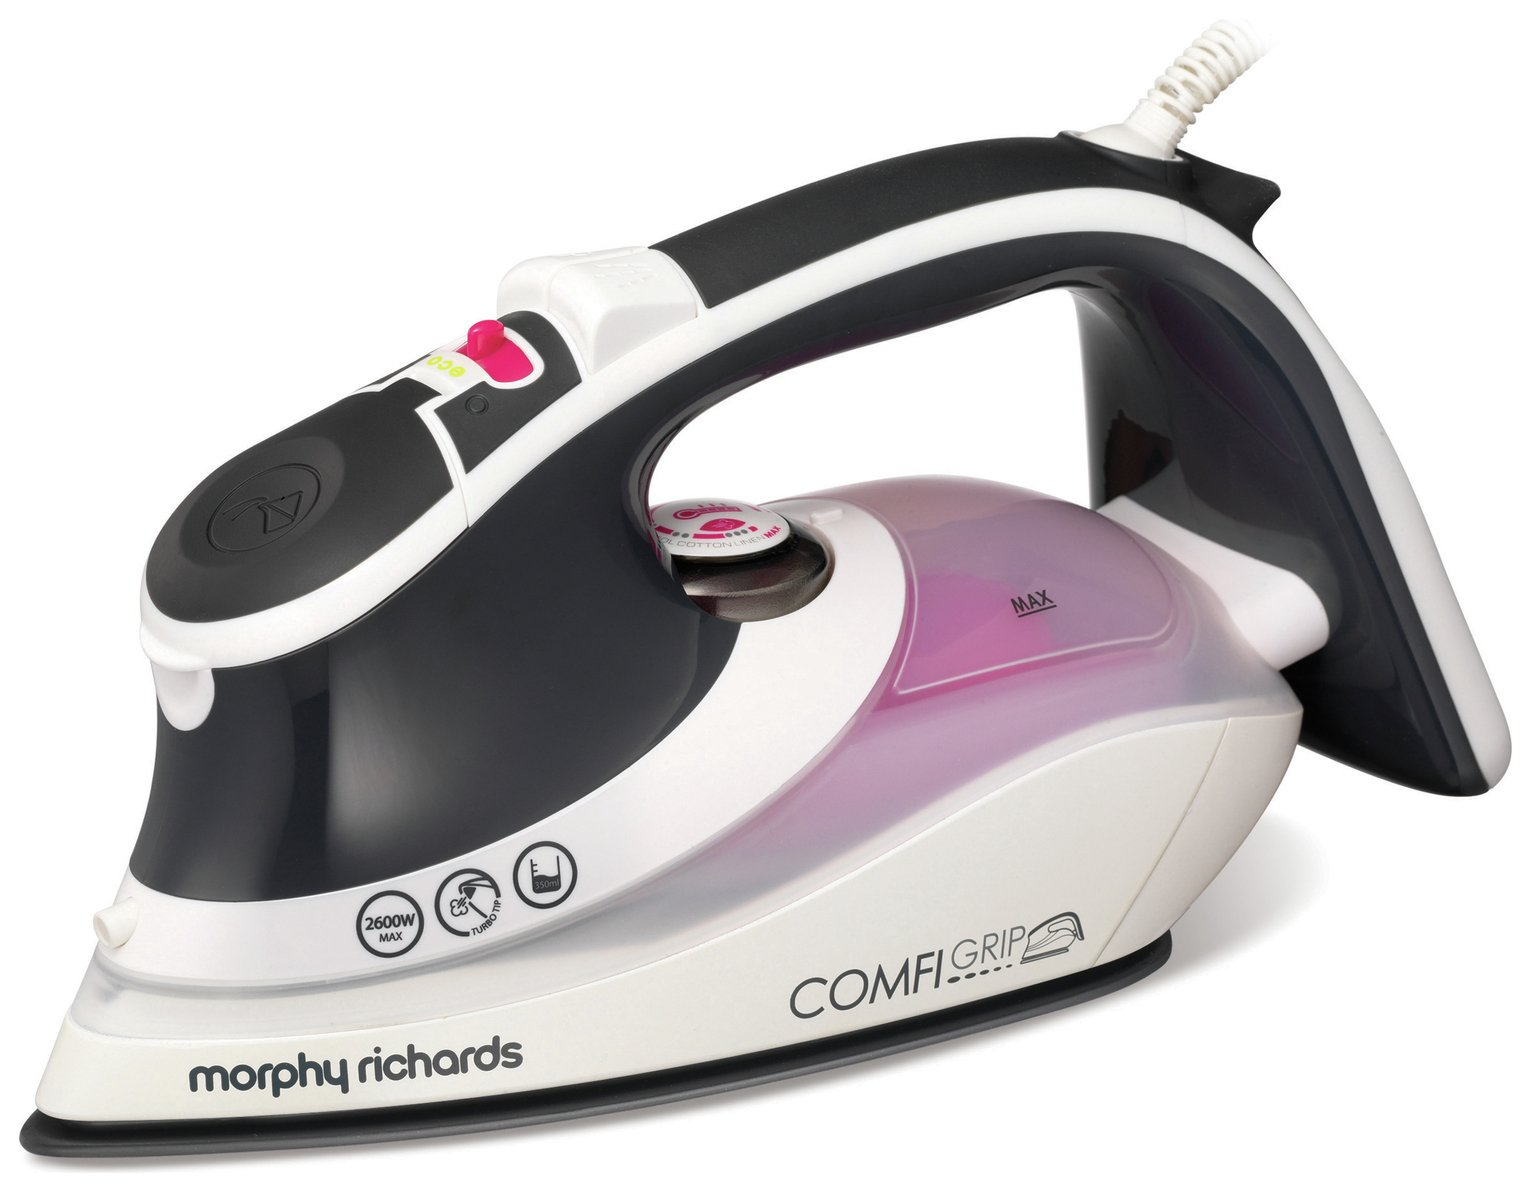 Morphy Richards 301020 ComfiGrip Steam Iron